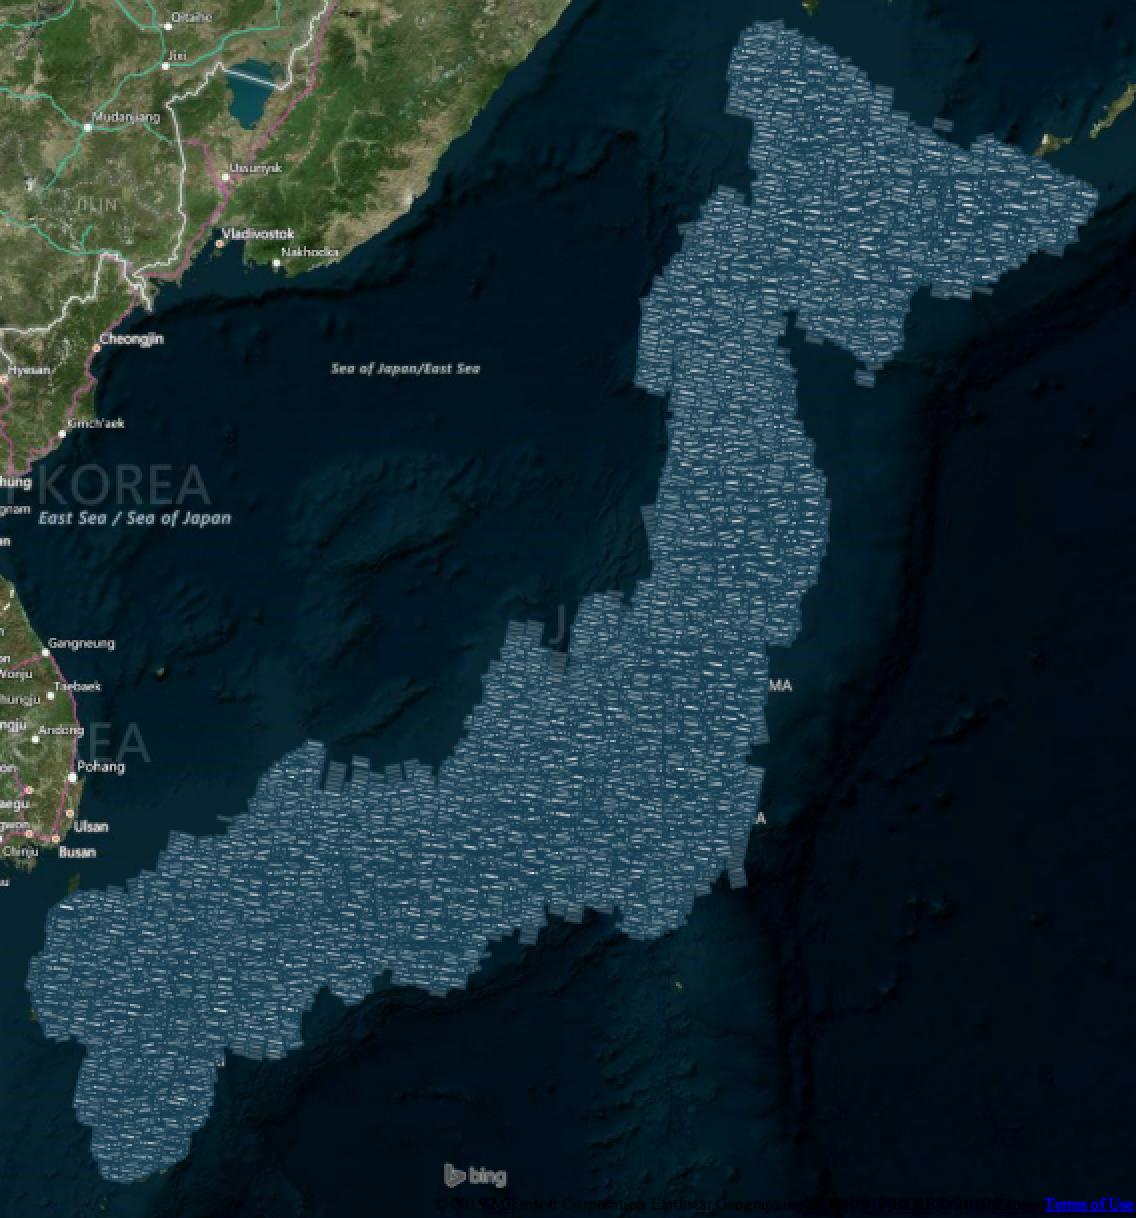 Medium resolution satellite imagery coverage of Japan